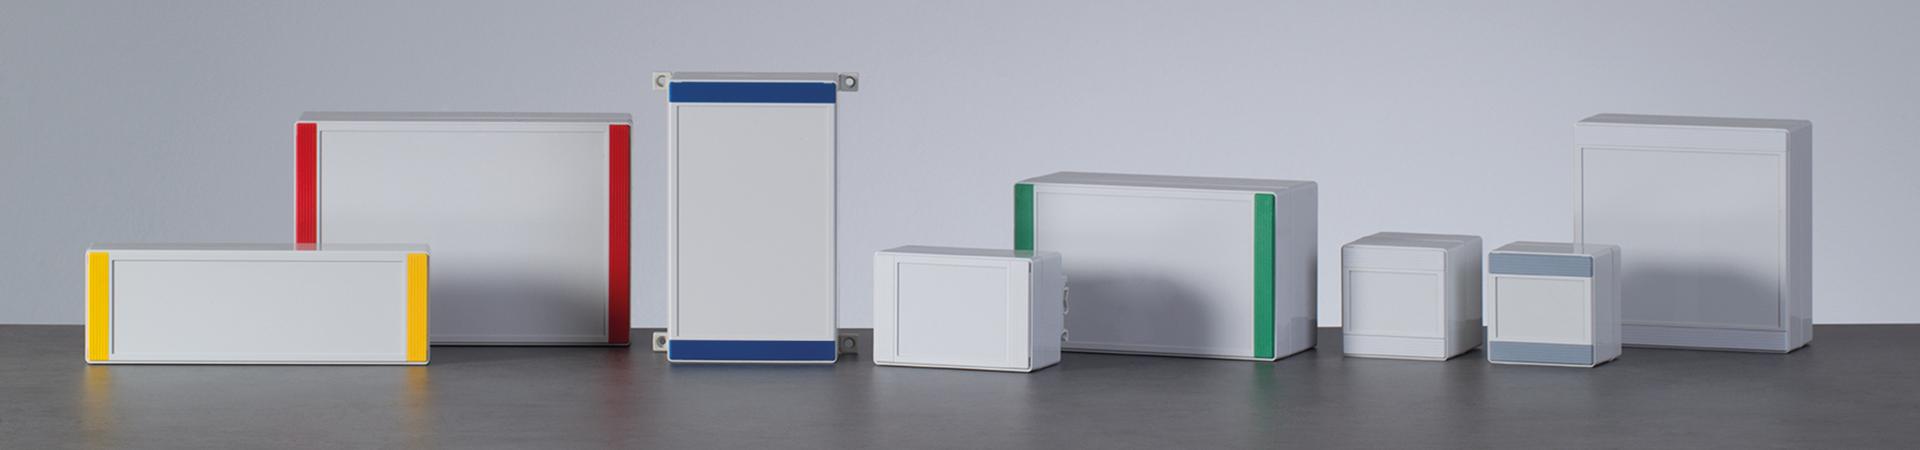 ROBUST-BOX